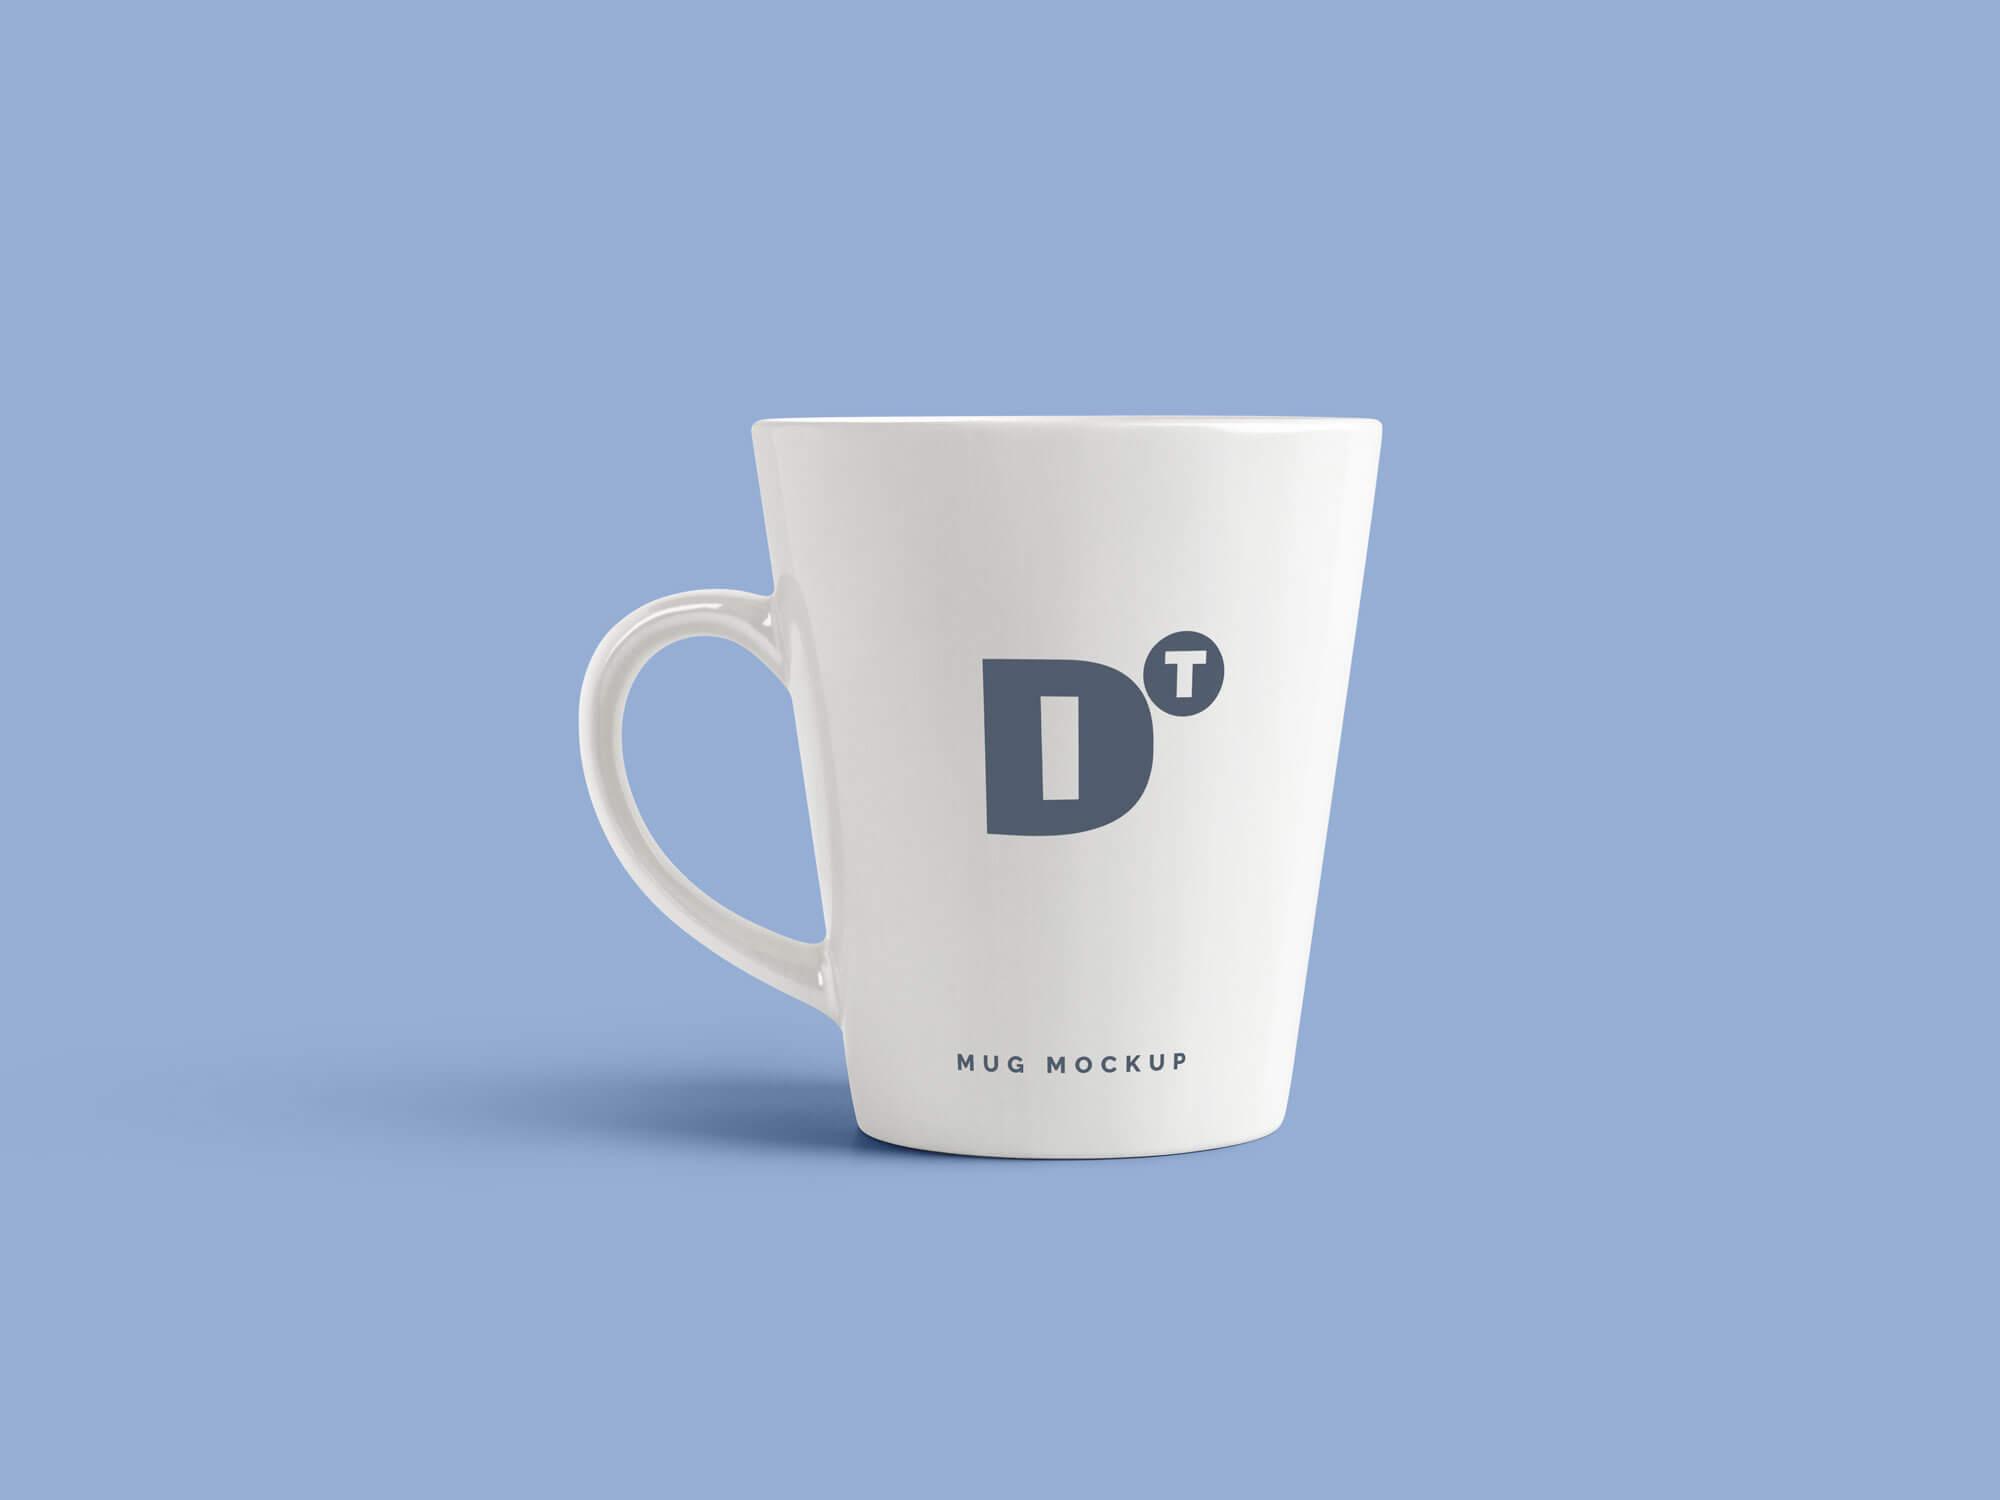 Free-Ceramic-Coffee-Mug-Mockup-PSD